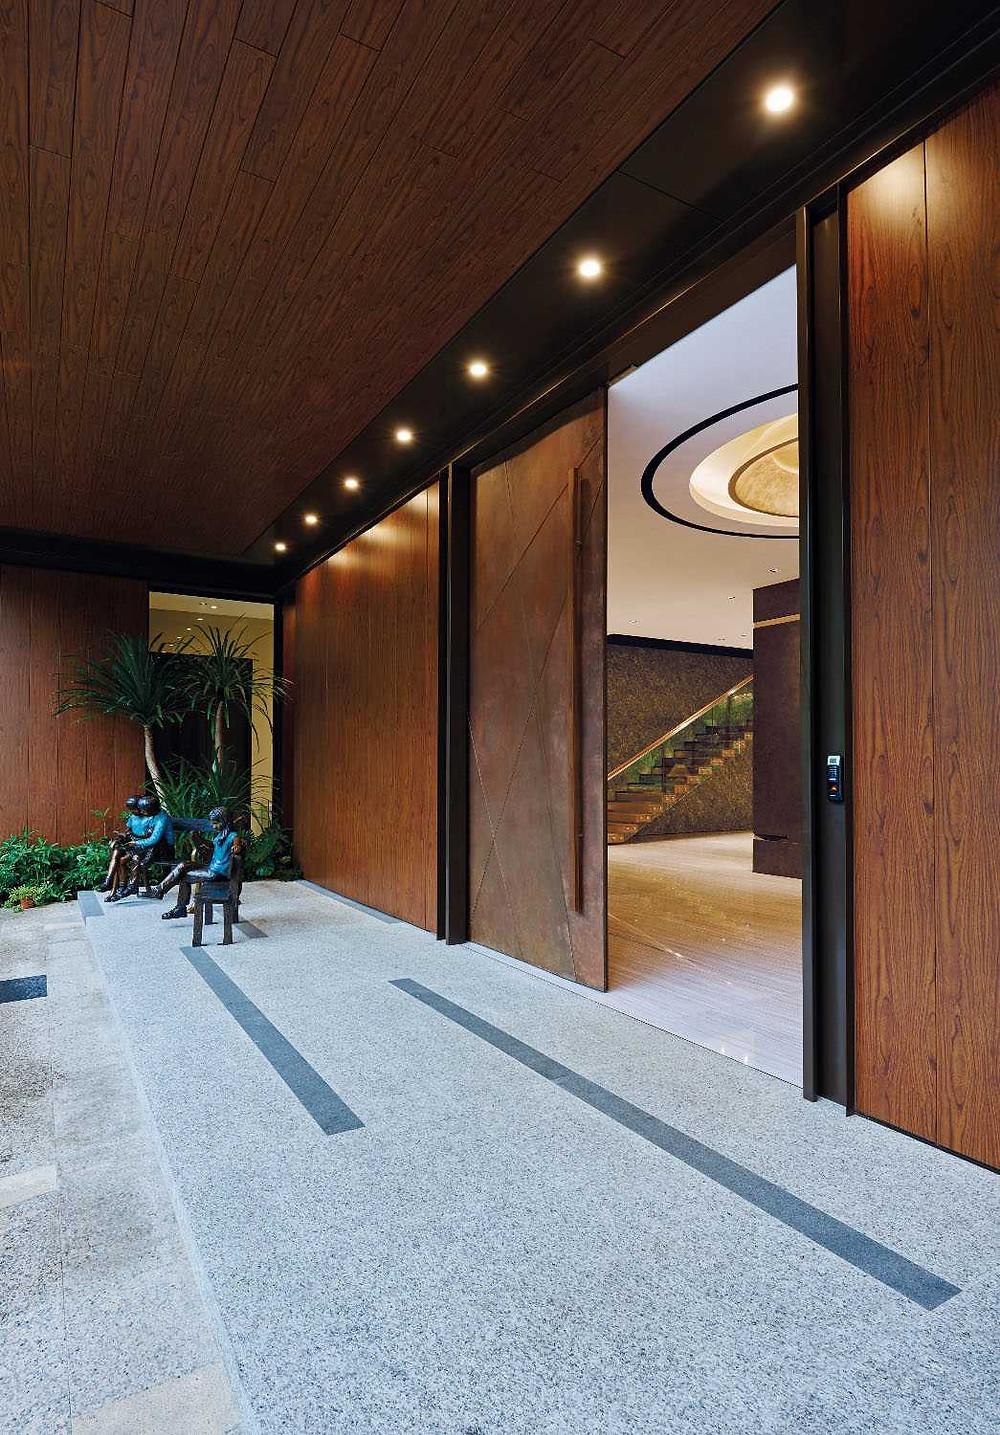 Singapore Tatler Homes - Good Class Bungalow - Best Landed Property - Leedon Park - Designworx Interior Consultant - Best Interior Designer Singapore